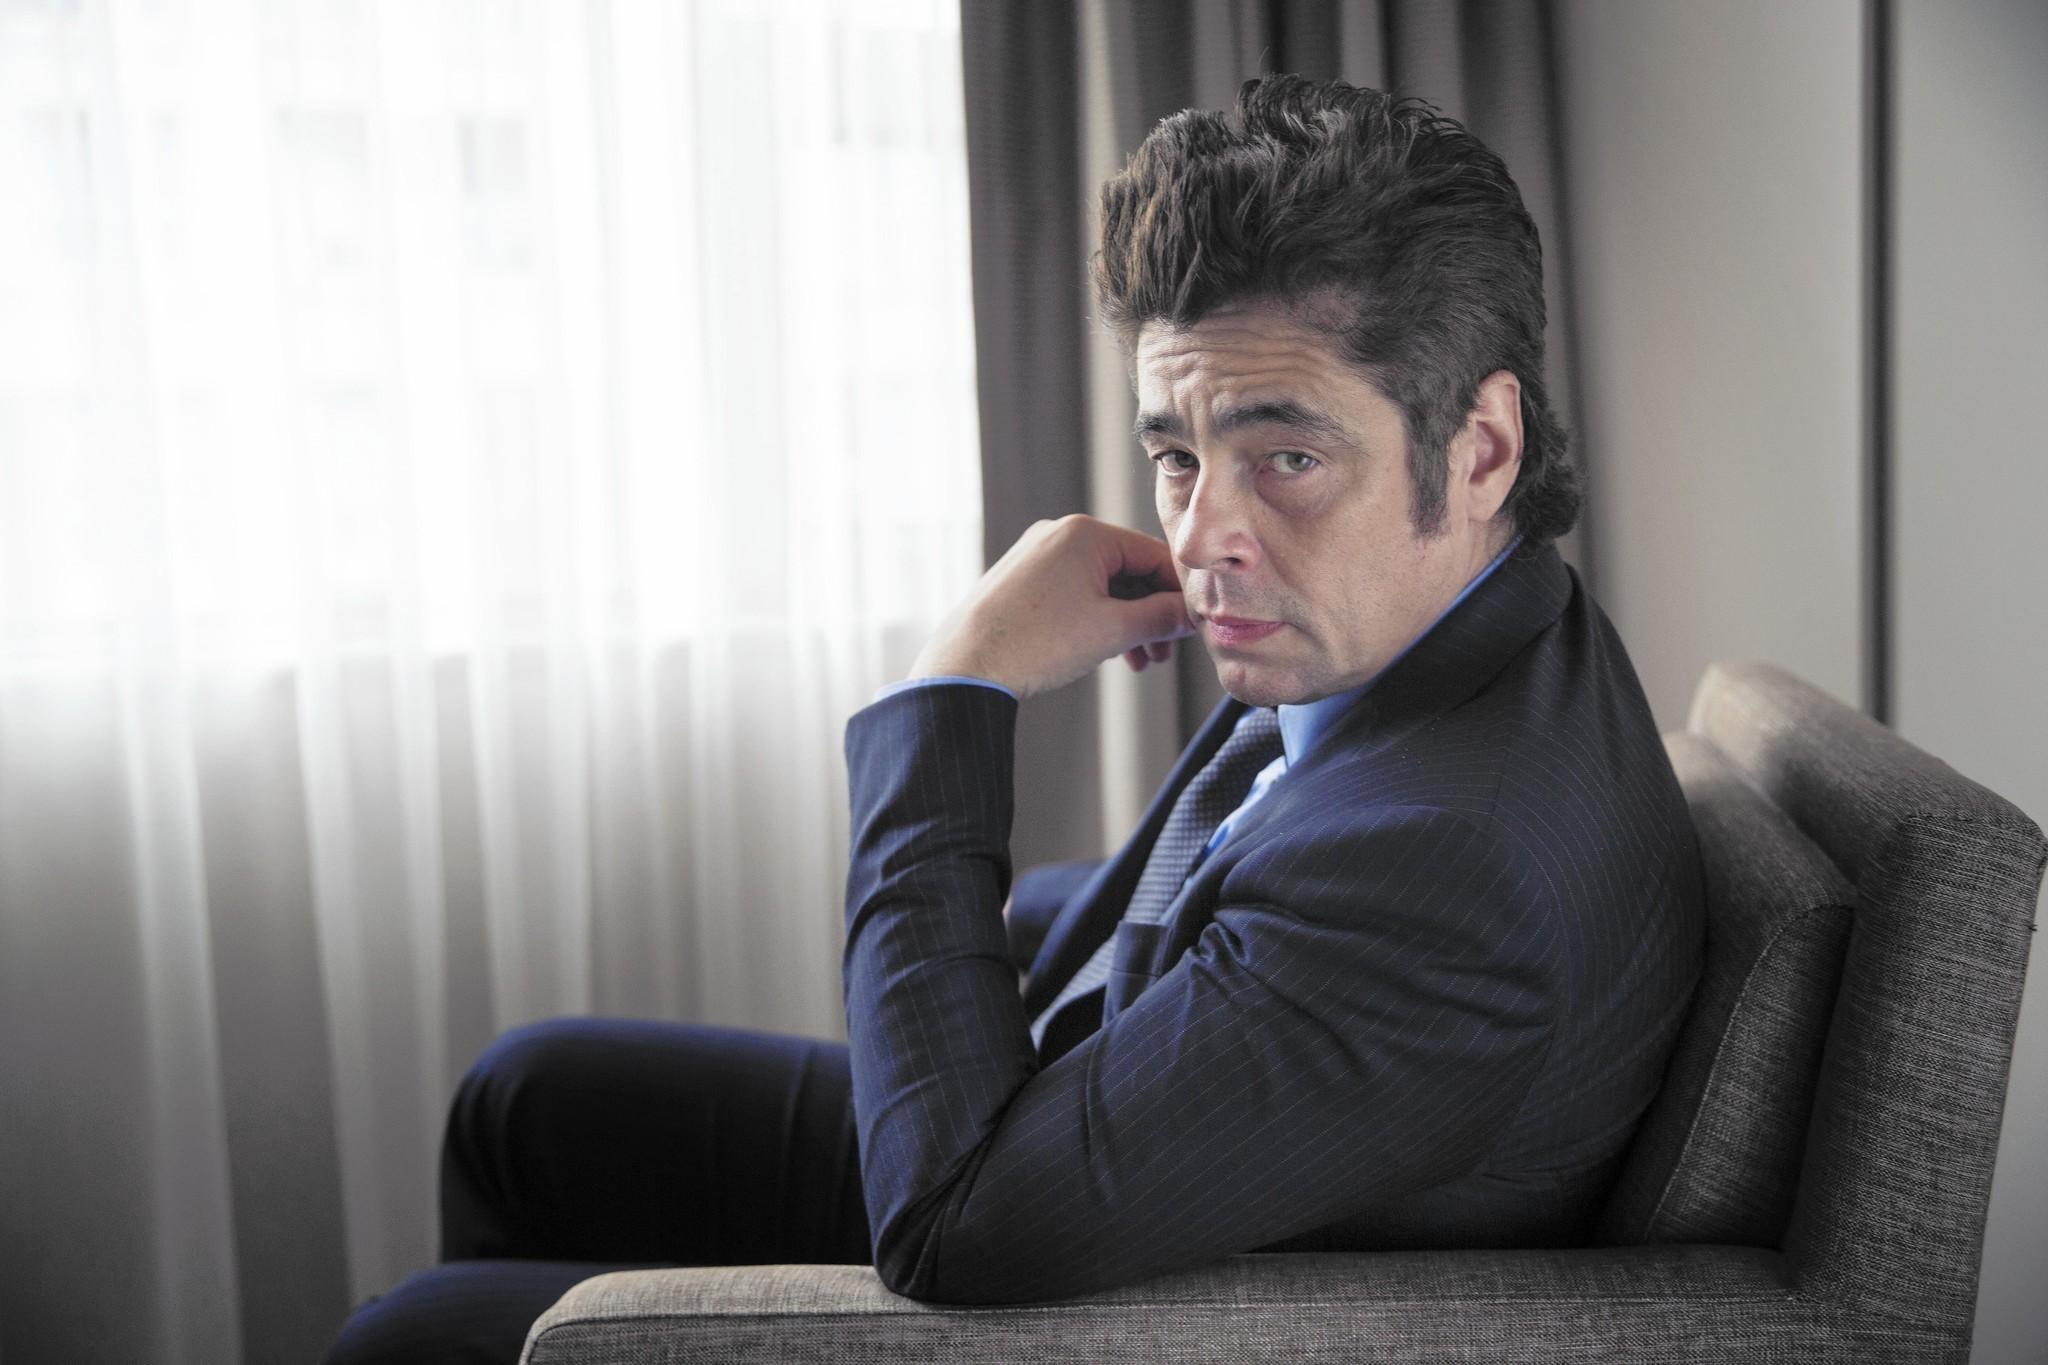 Benicio Del Toro Knows You've Seen Him In Drug War Stories